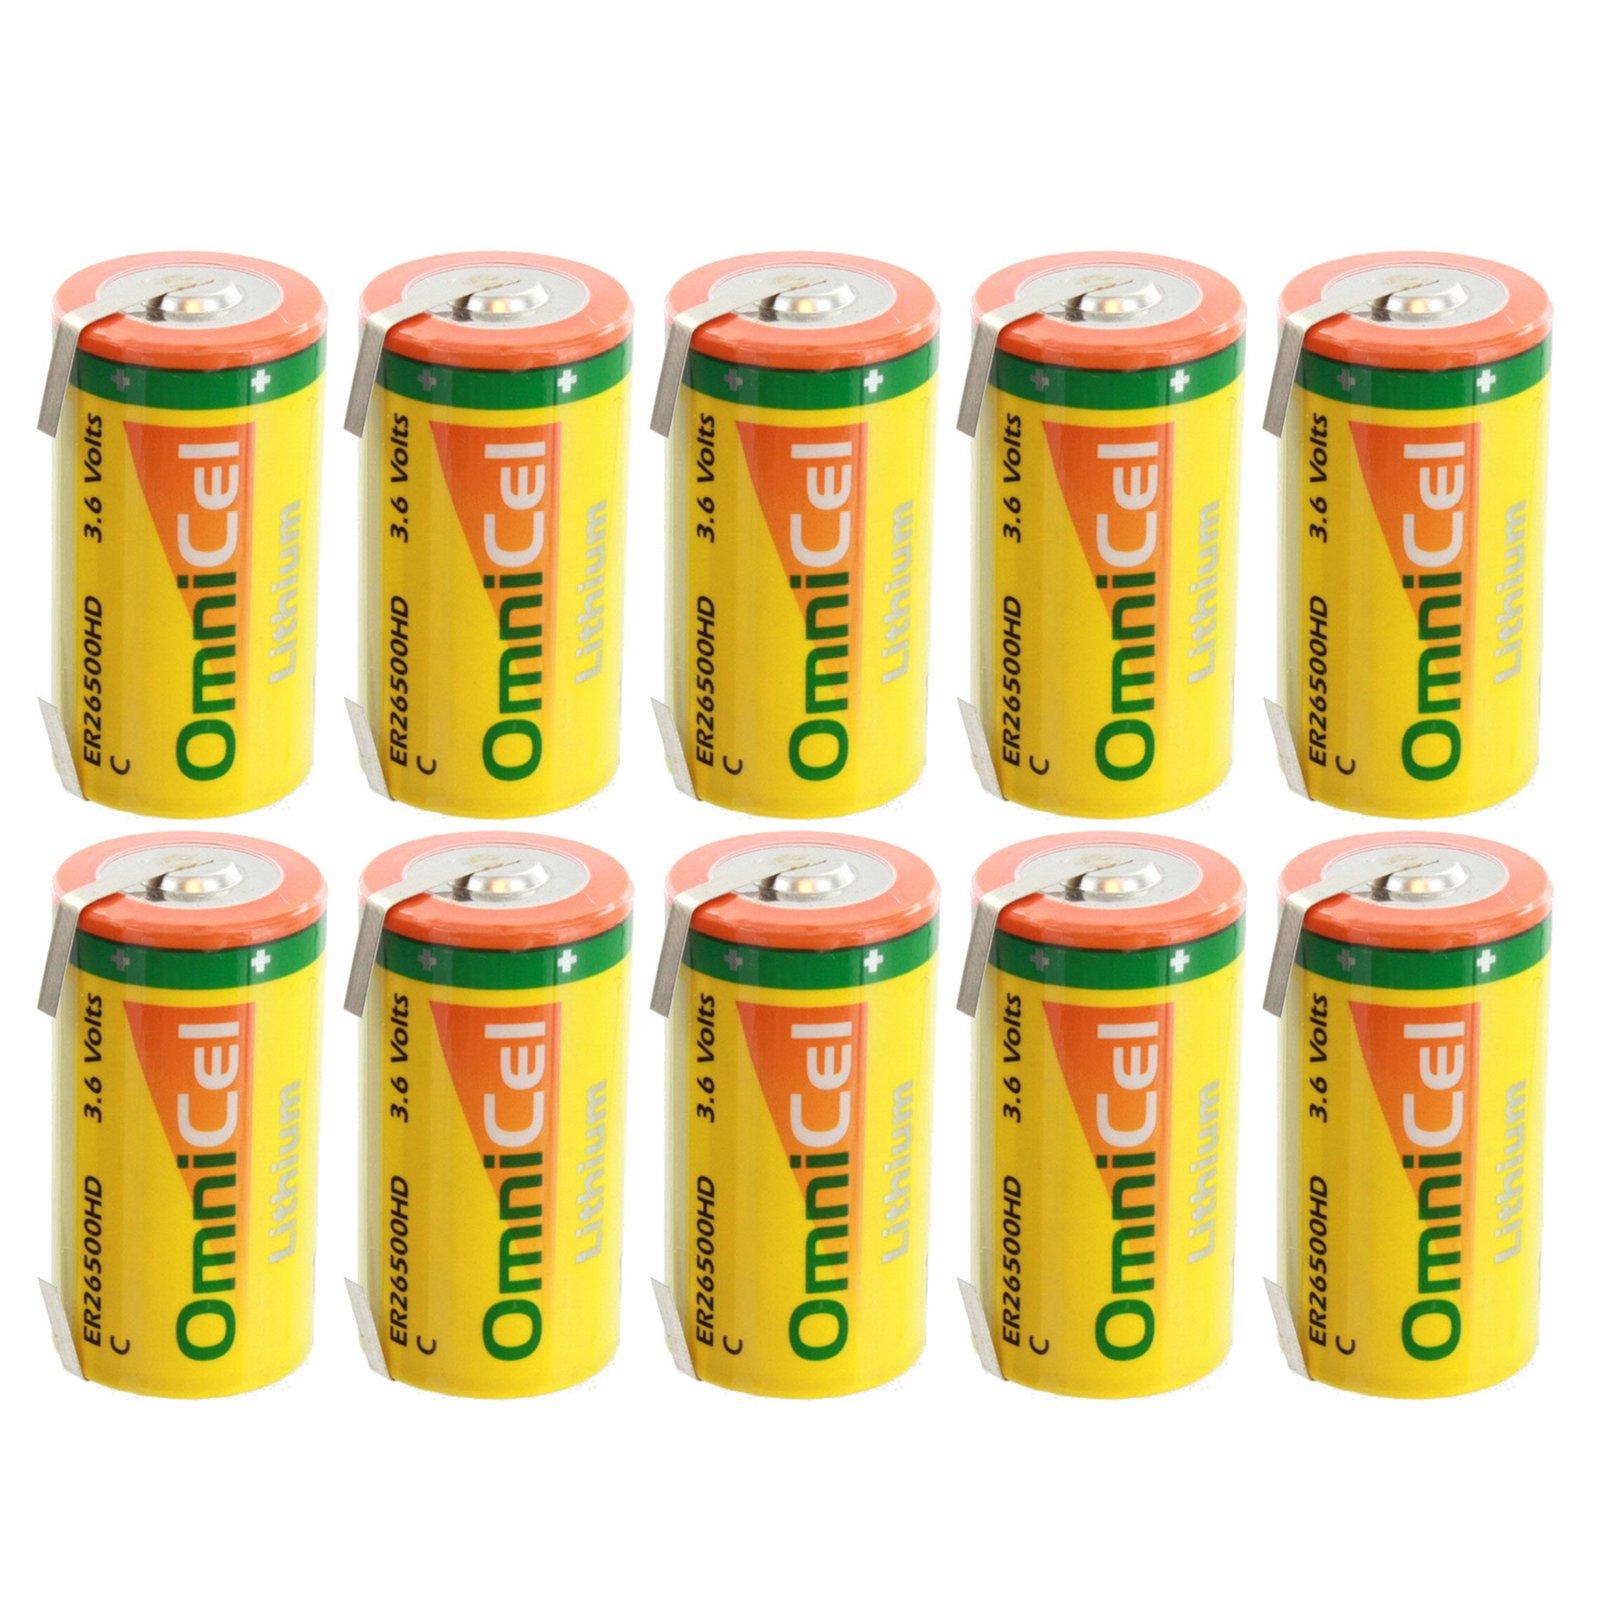 10x OmniCel ER26500HD 3.6V 6.5Ah Sz C Lithium Battery Tabs RFID Beacons AMR